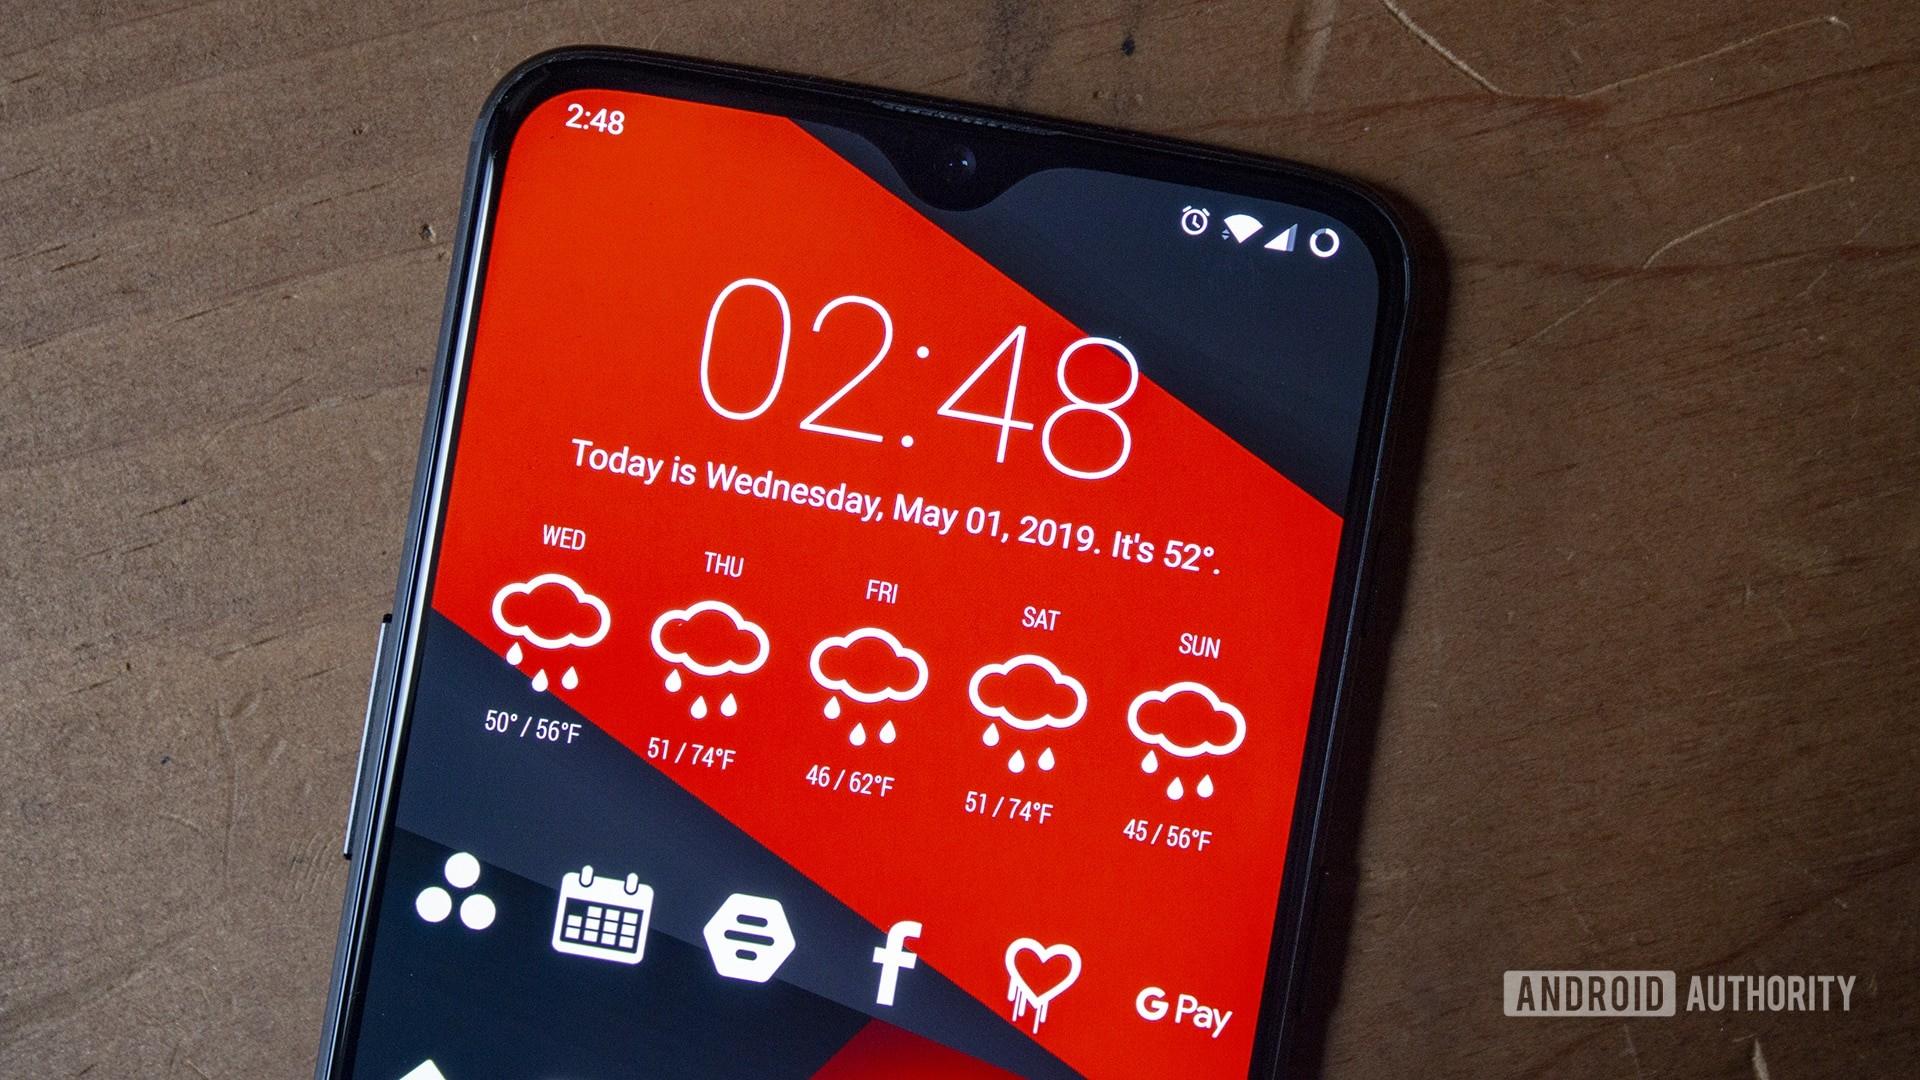 OnePlus 6T display with custom widget